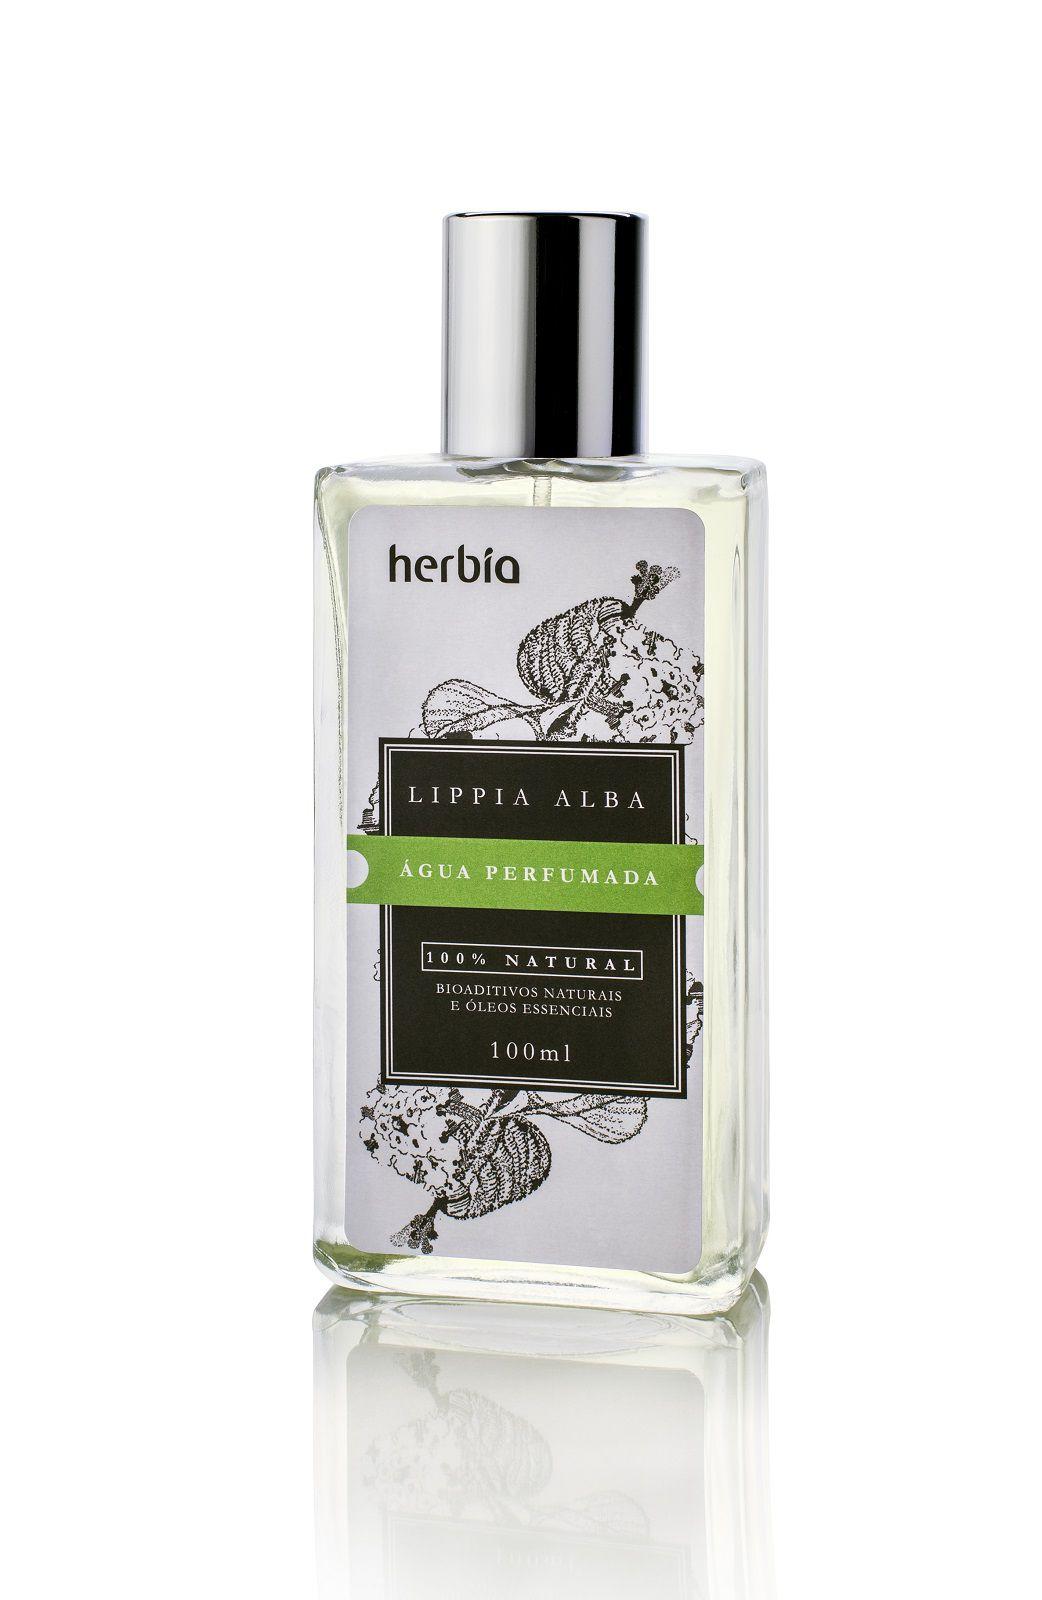 Água Perfumada Lippia Alba 100mL Herbia